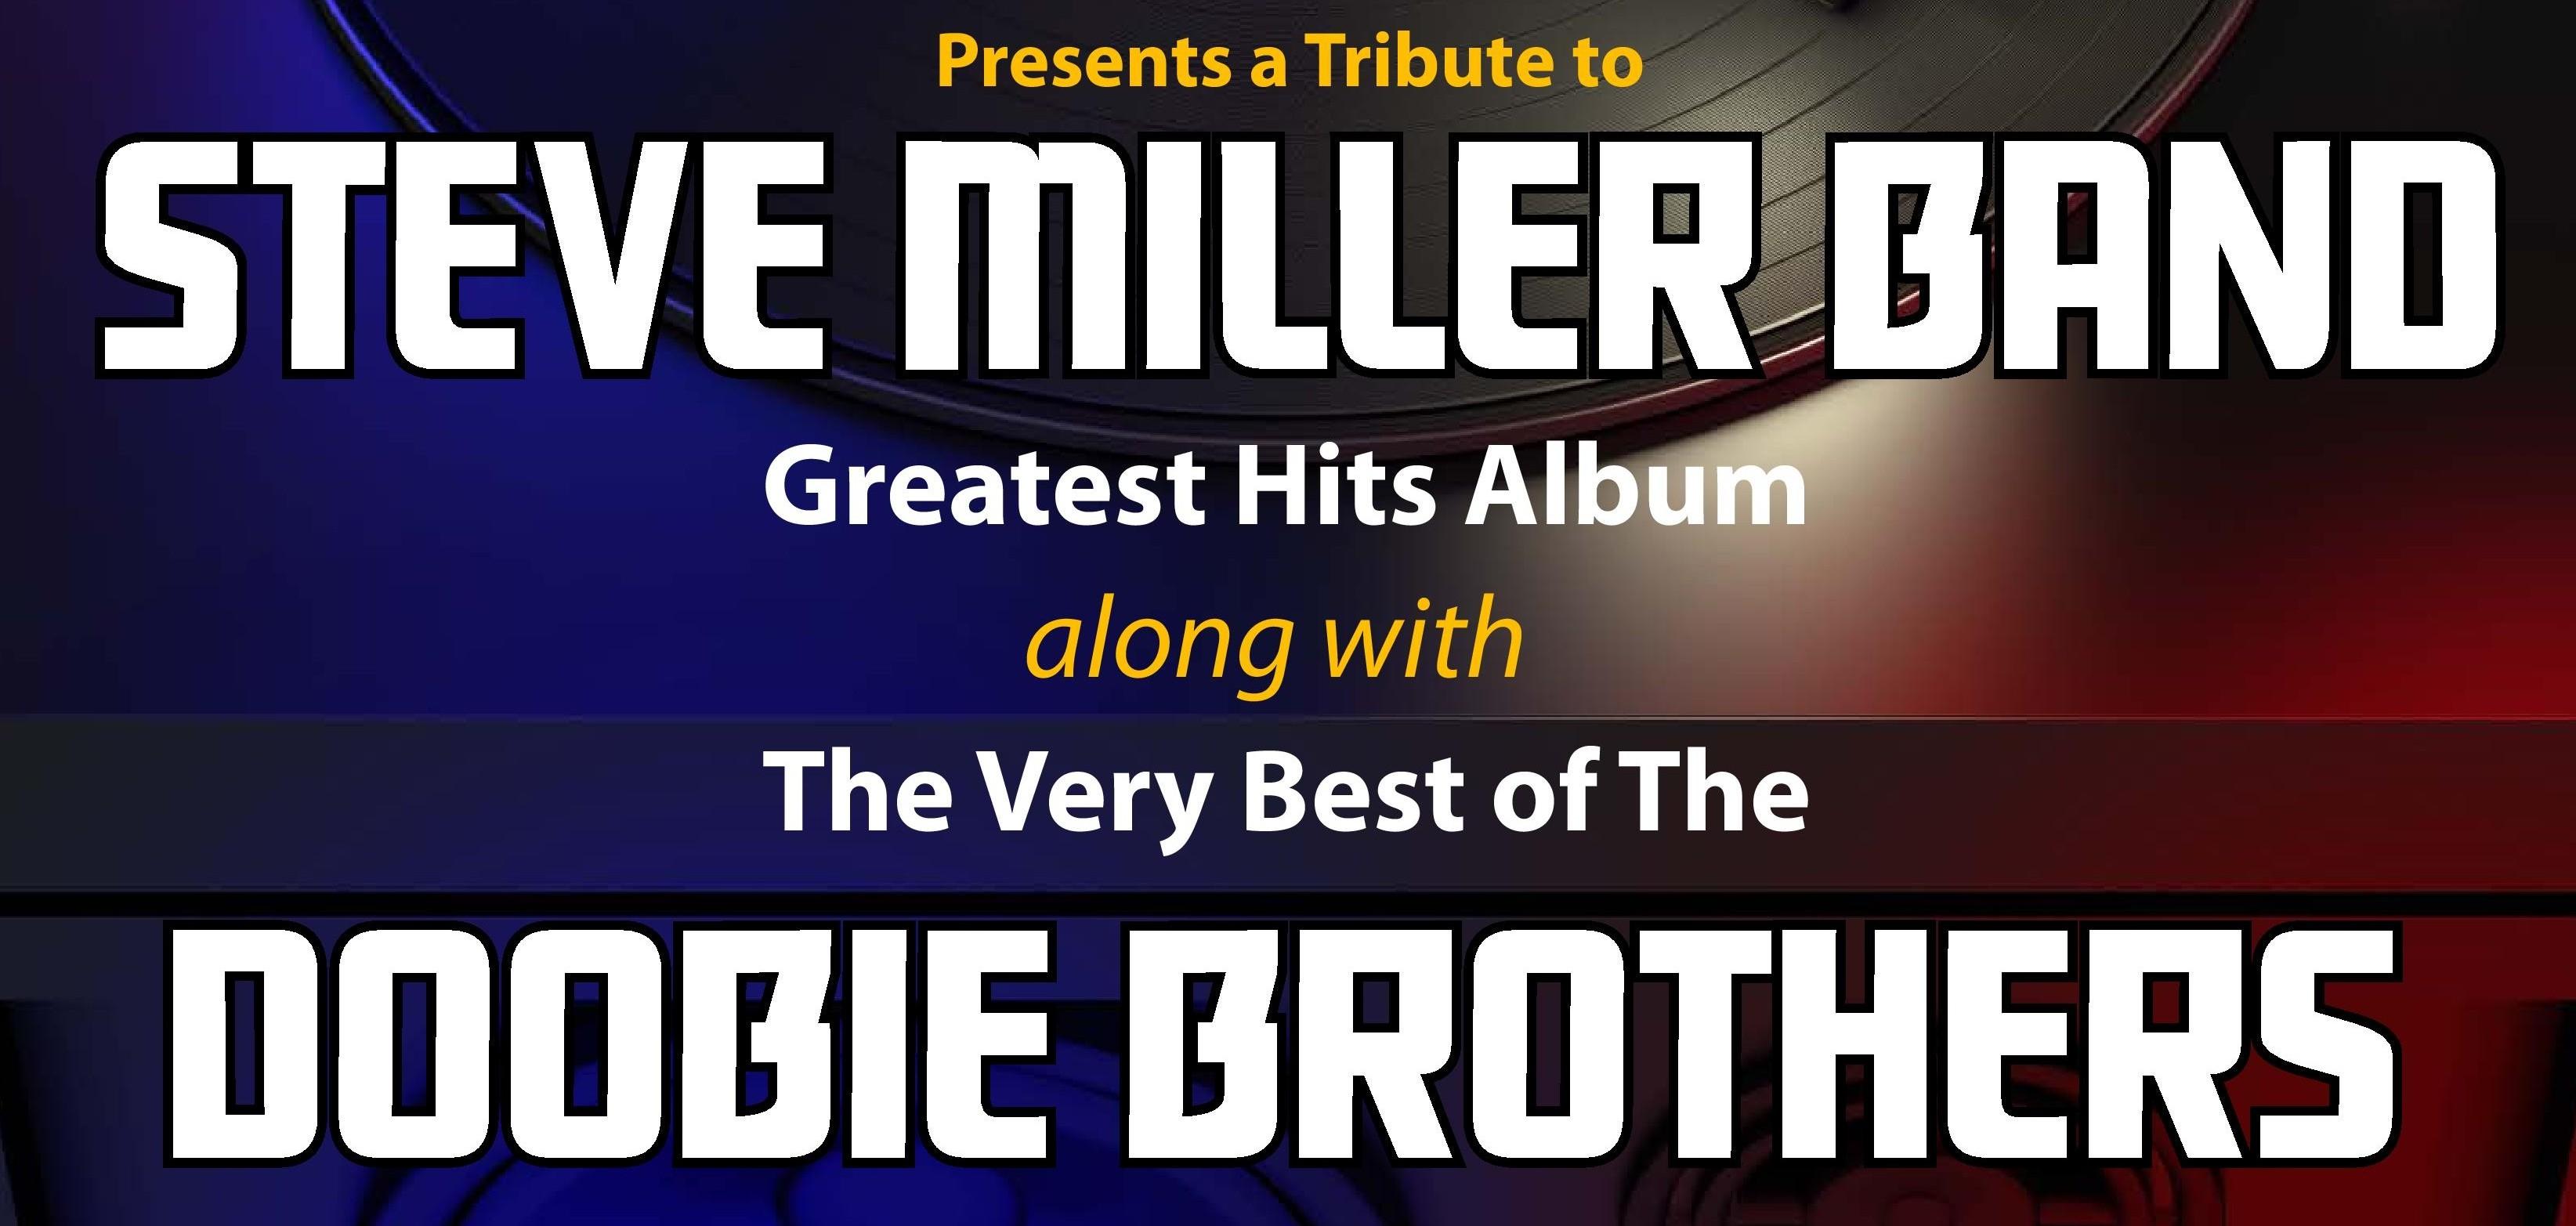 Steve Miller Doobie Bros Poster Cadablanca 11-28-15-page-001